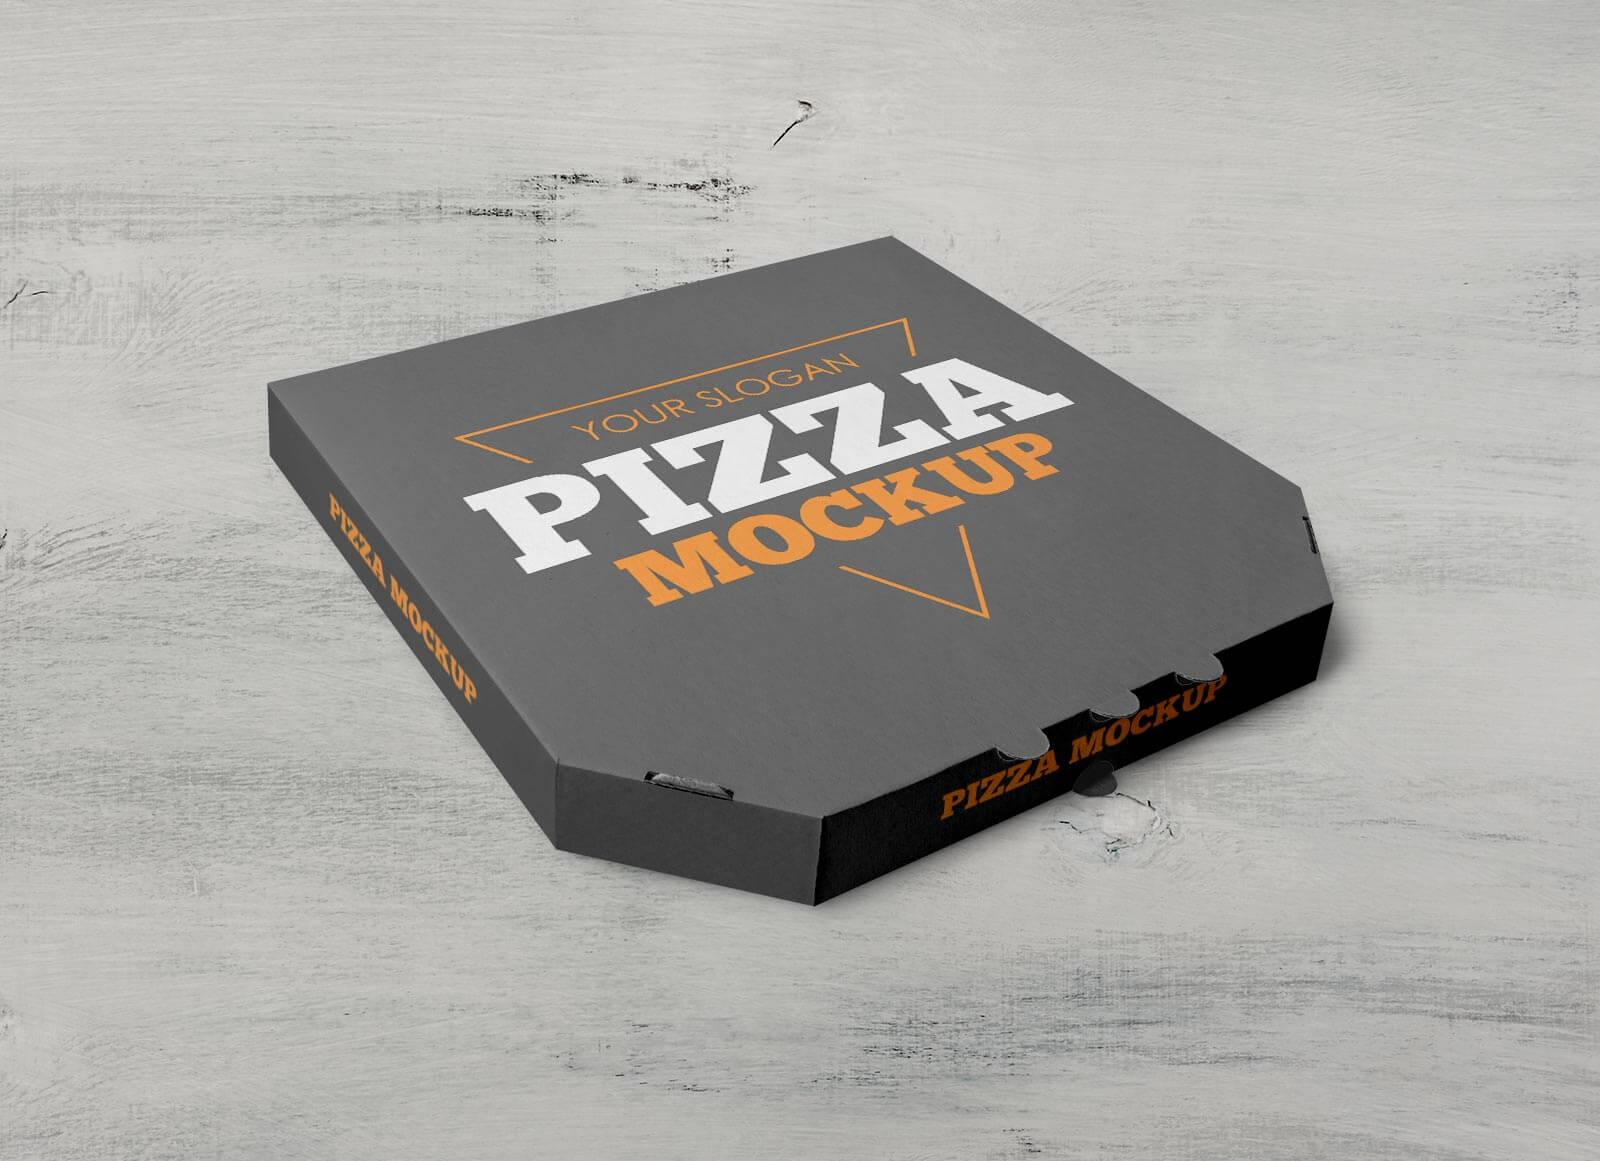 Free Takeaway Pizza Box Packaging Mockup PSD Set (2)